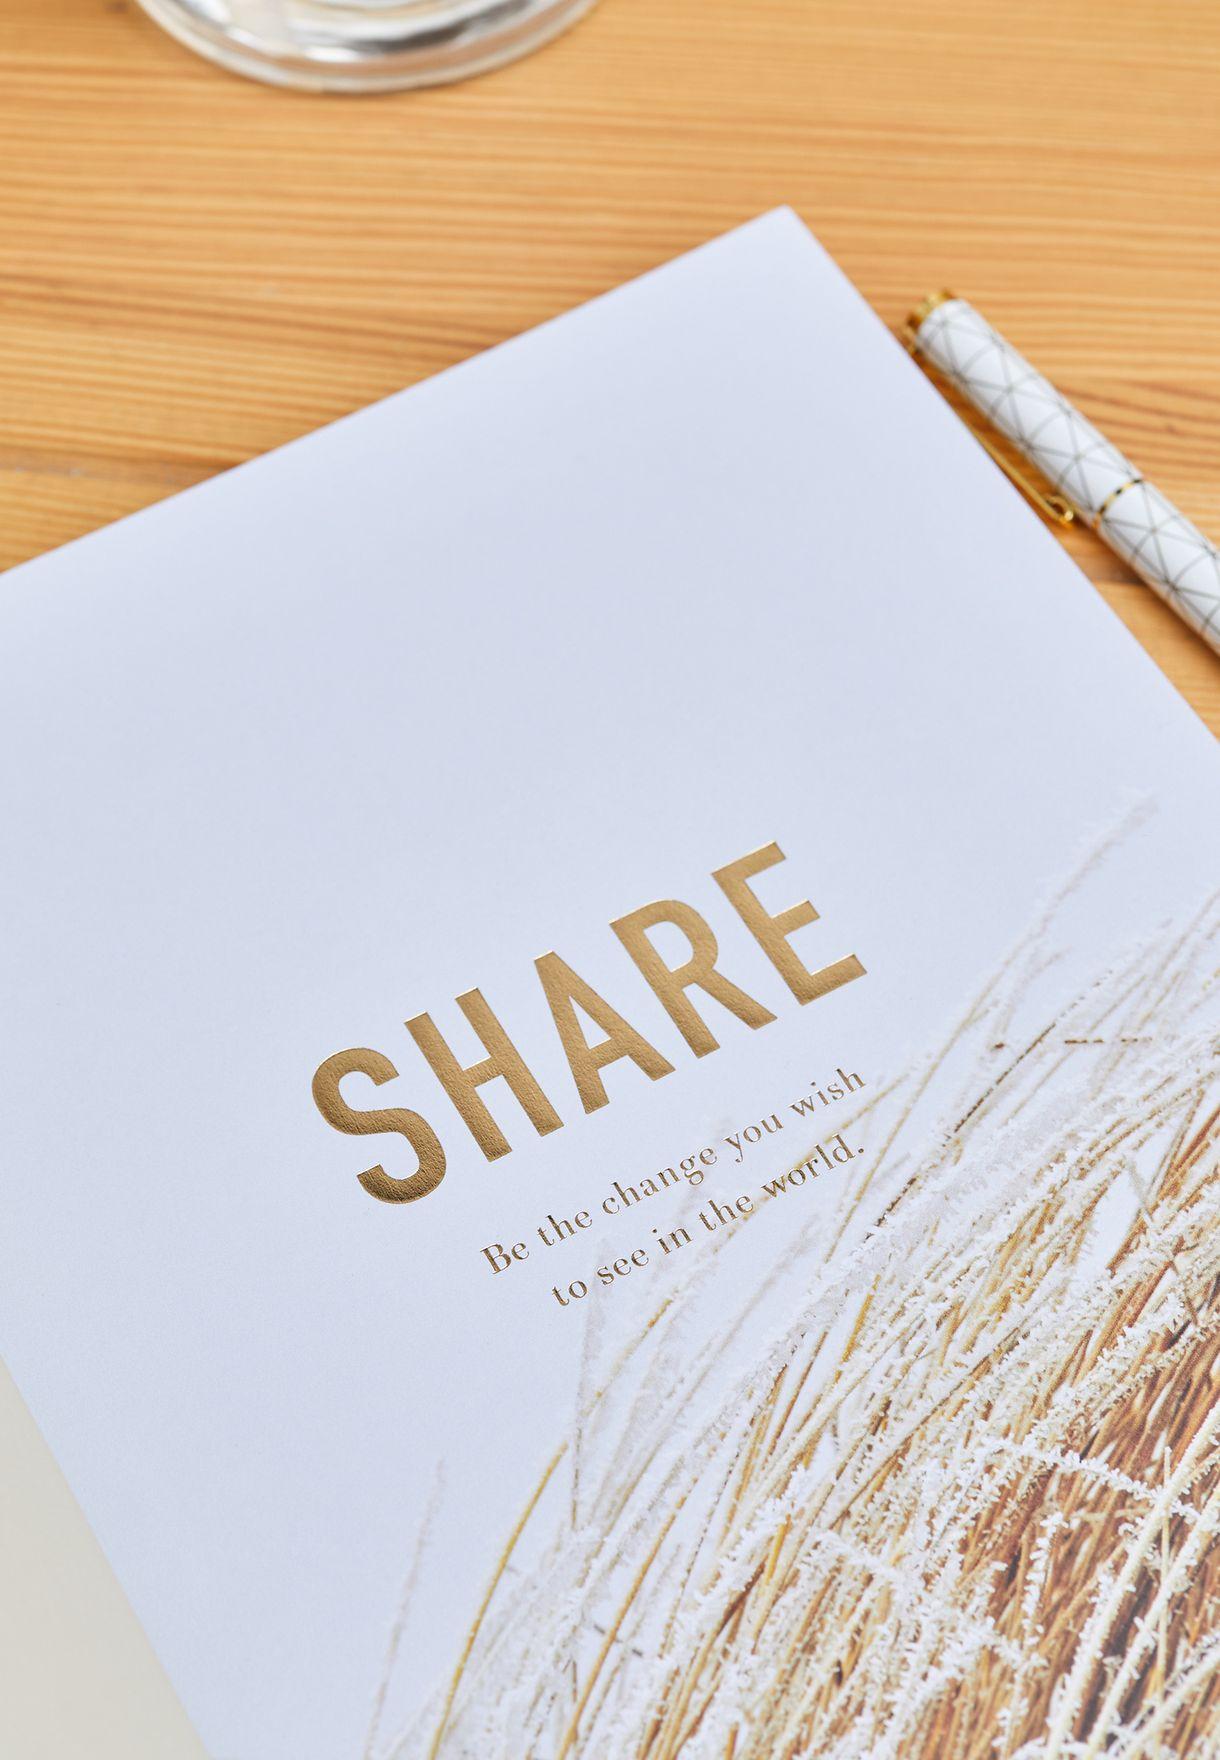 كتاب شير انسبايريشين (Share Book Inspiration)